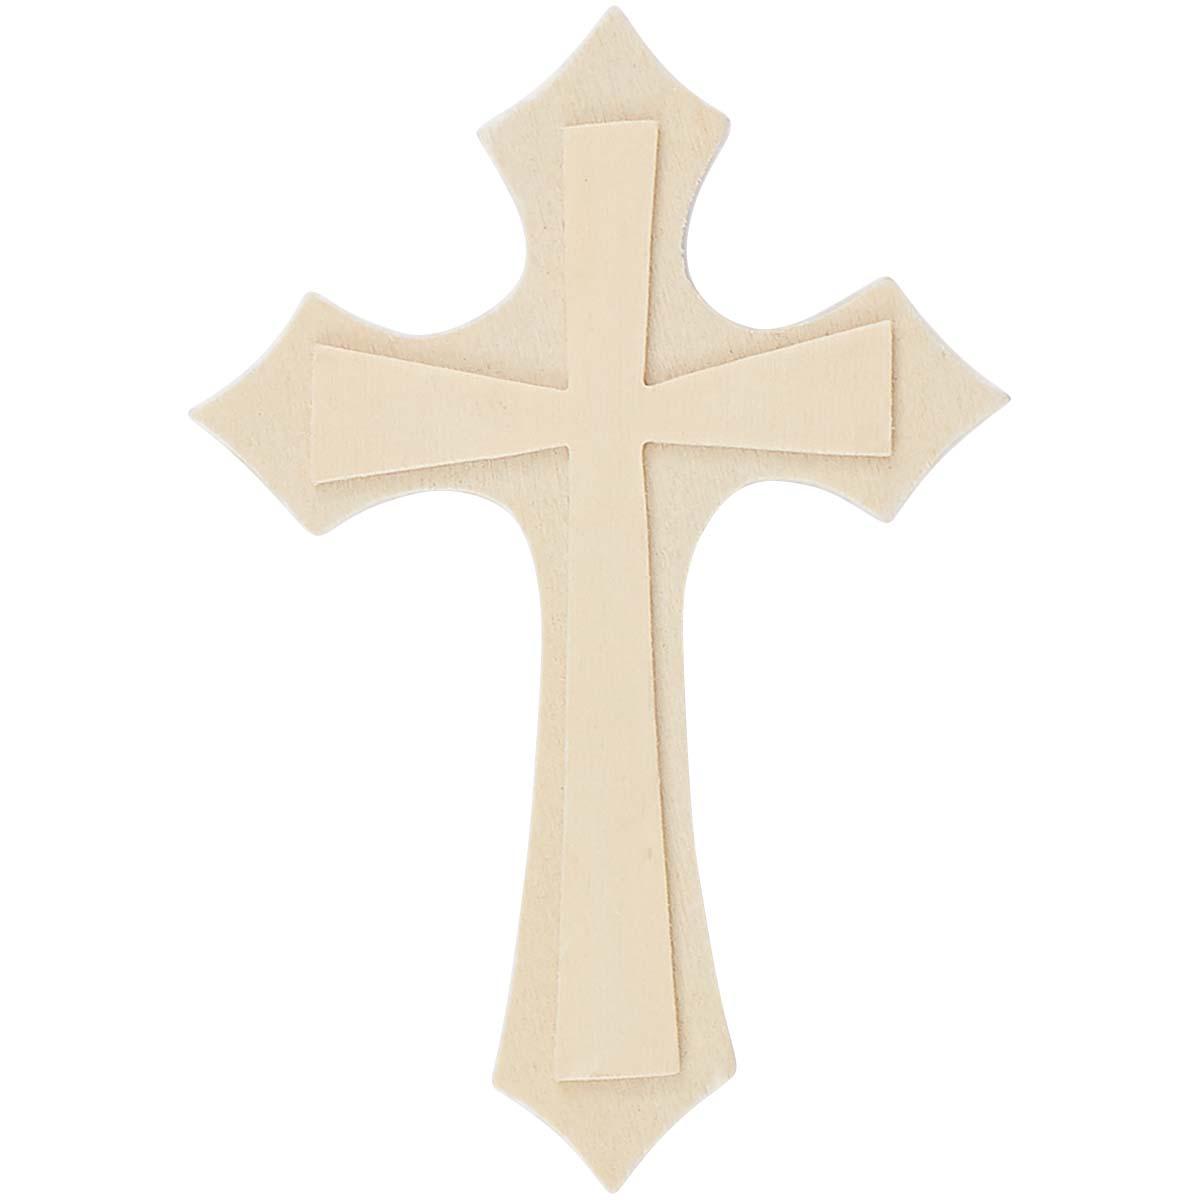 Plaid ® Wood Surfaces - Unpainted Shapes - Cross - 40651